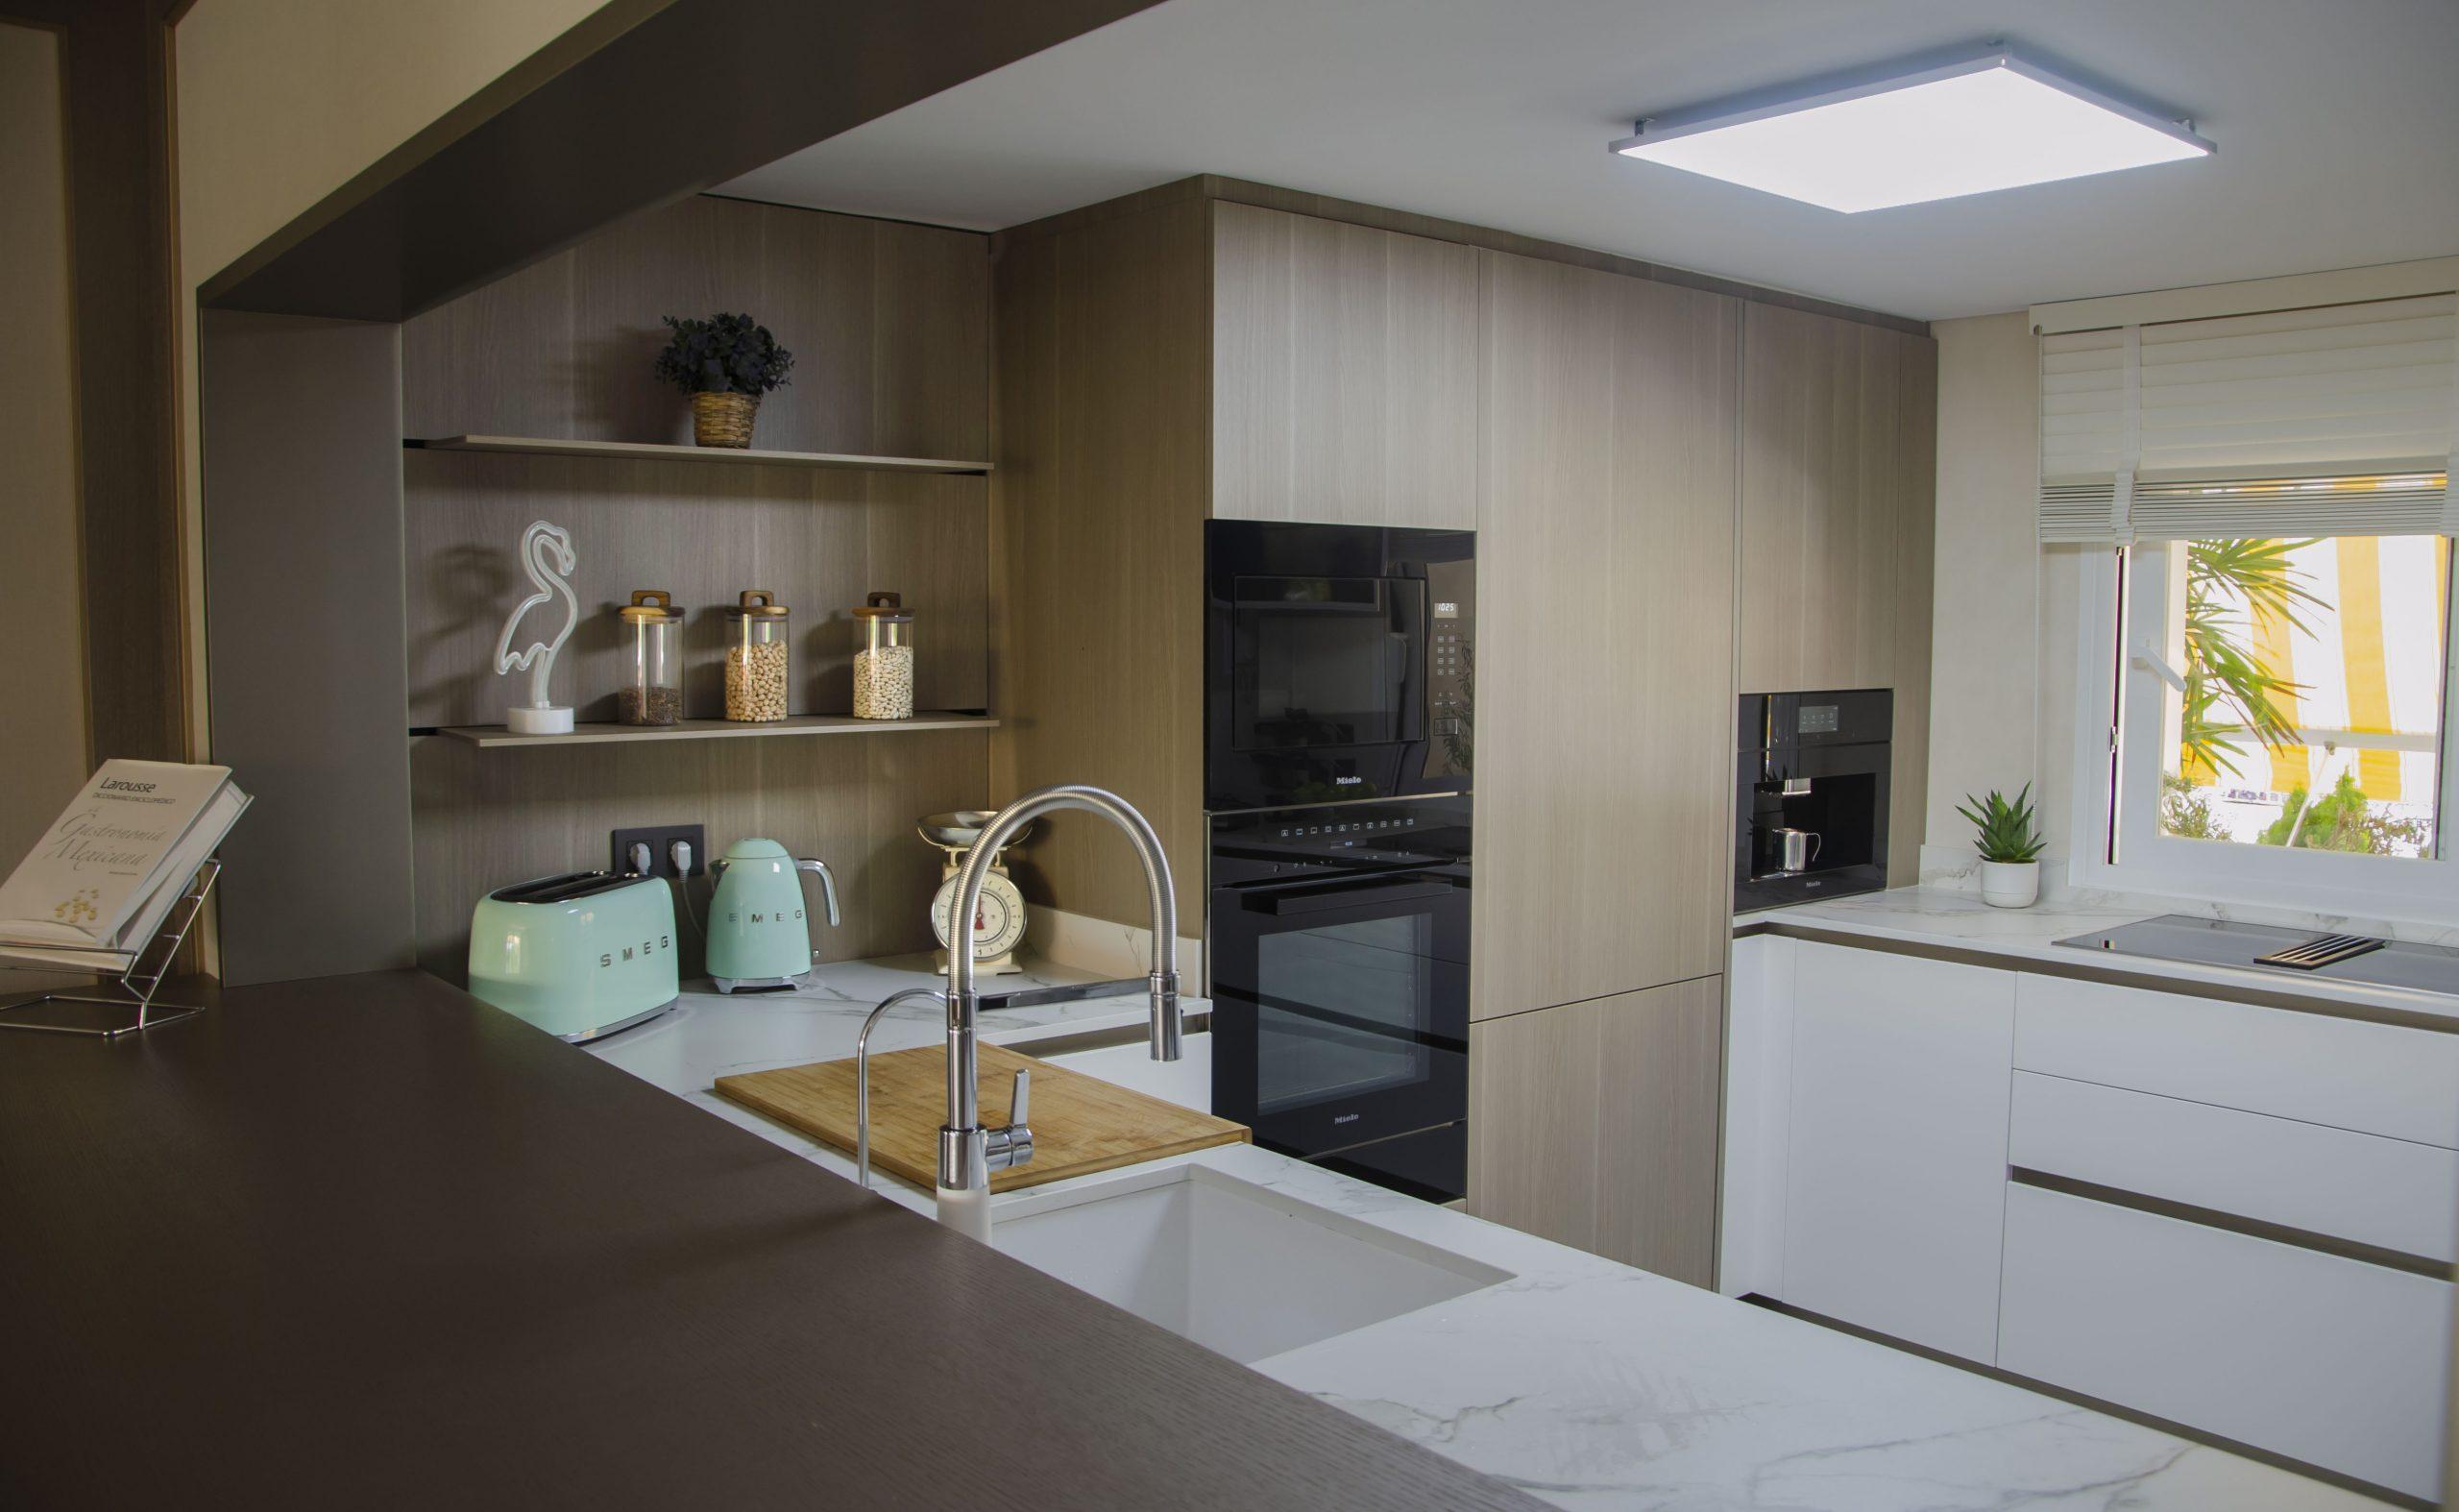 equipada miele cafran cocinas arrital ak_project